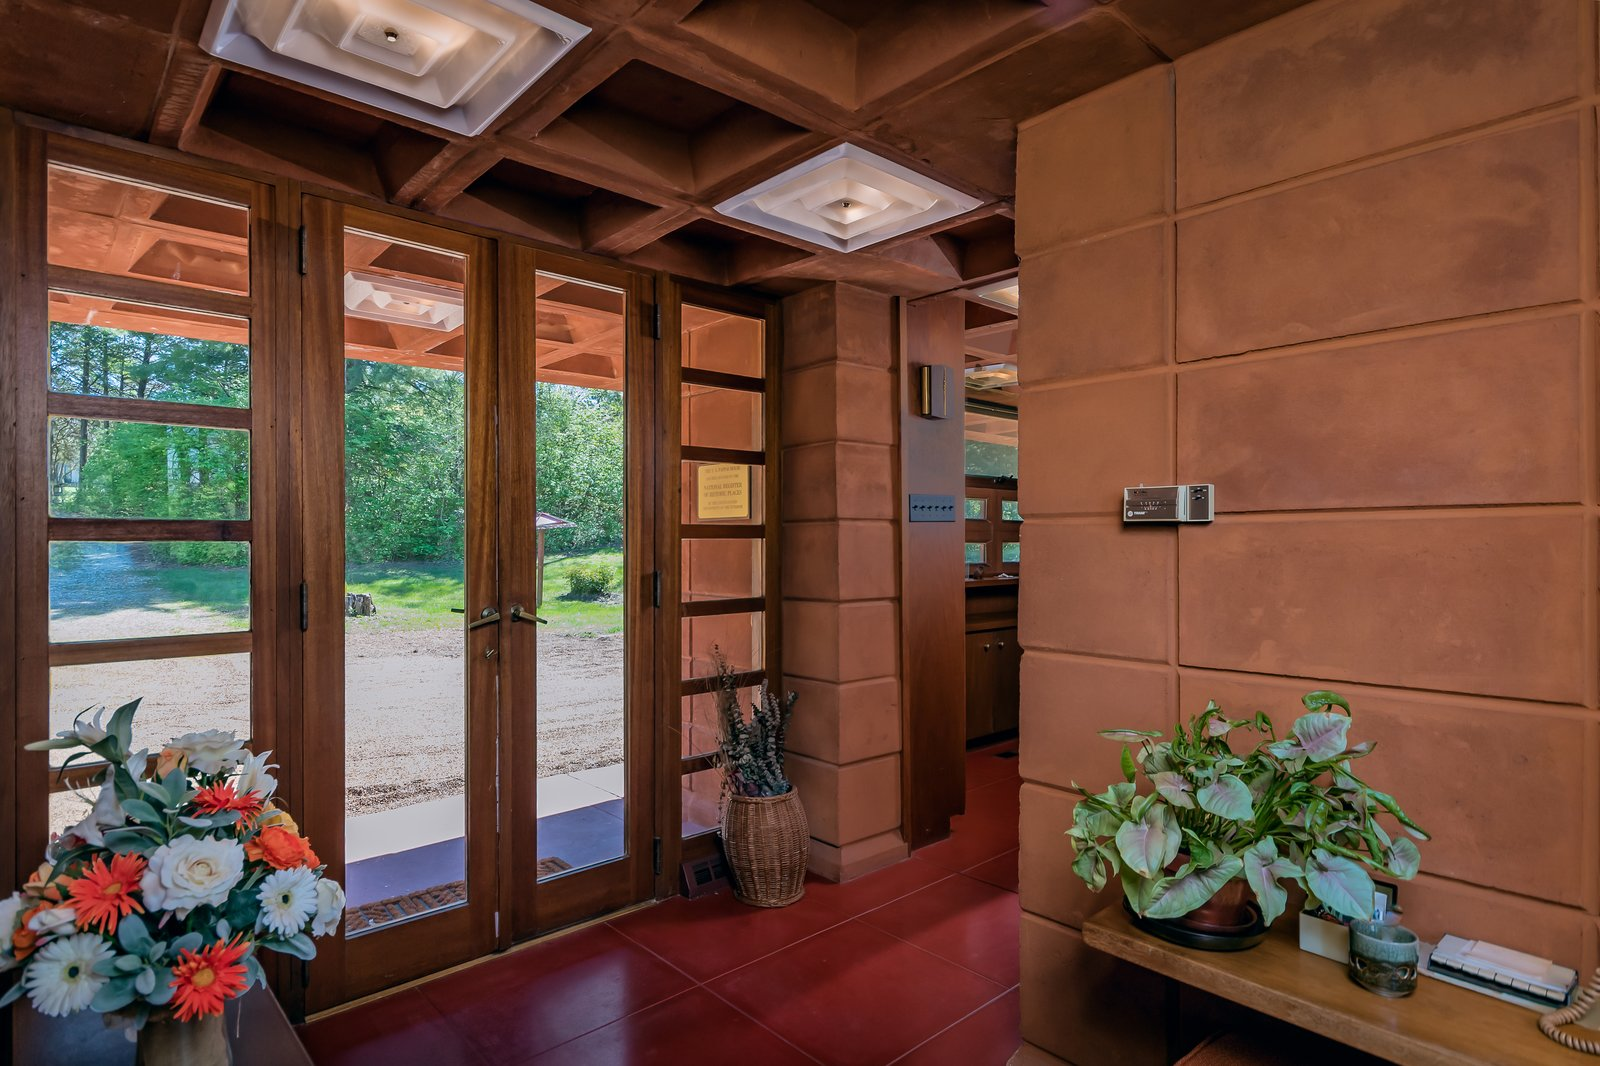 Frank Lloyd Wright Pappas House entrance